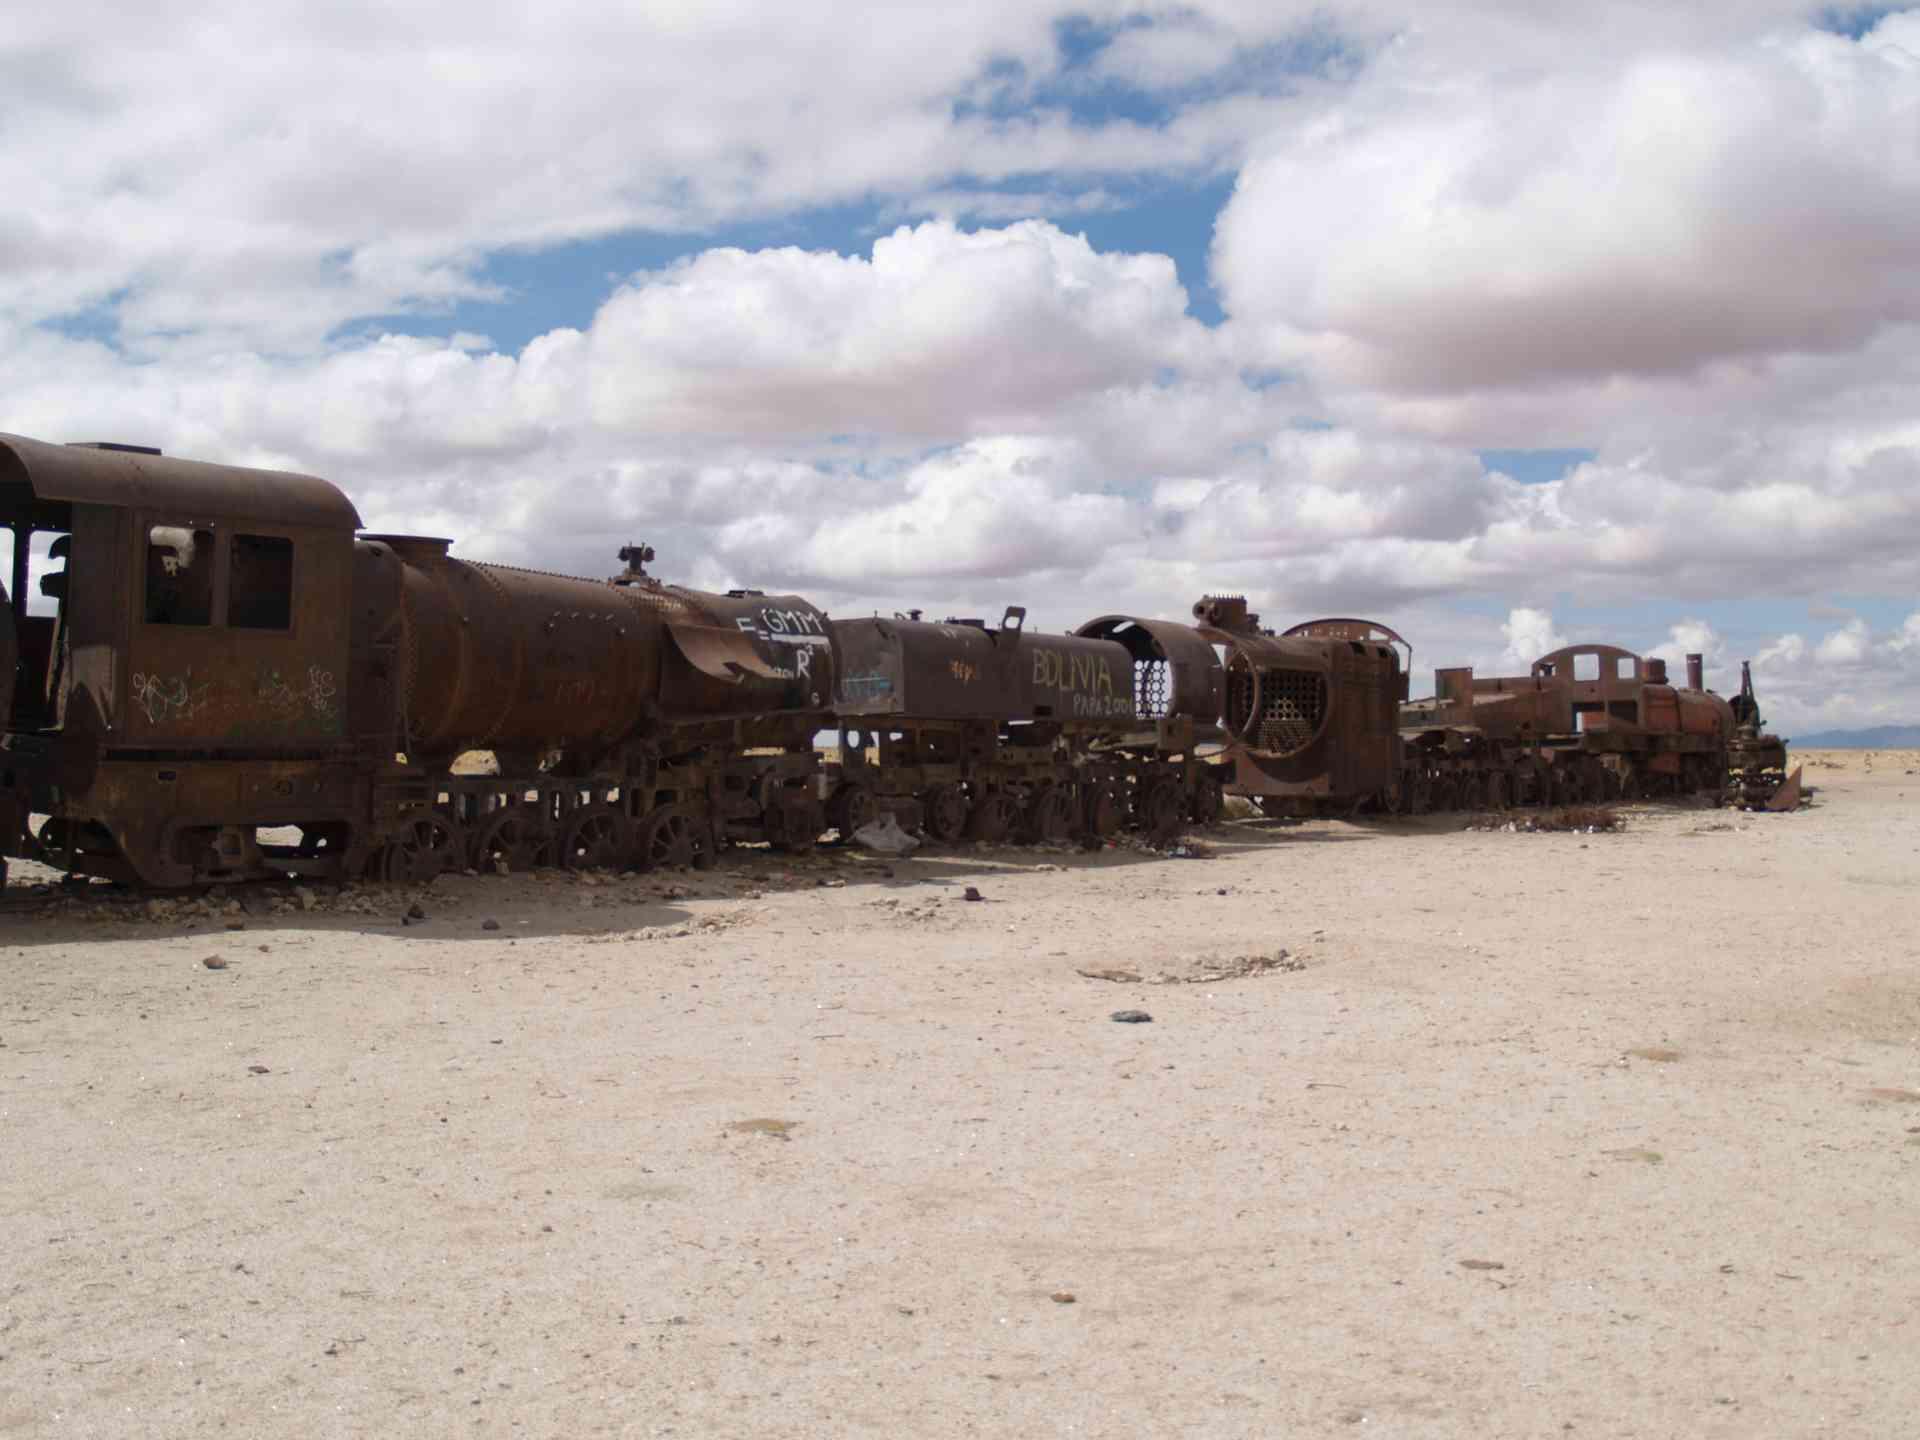 Uyuni train cemetery, Bolivia by Annelieke Huijgens